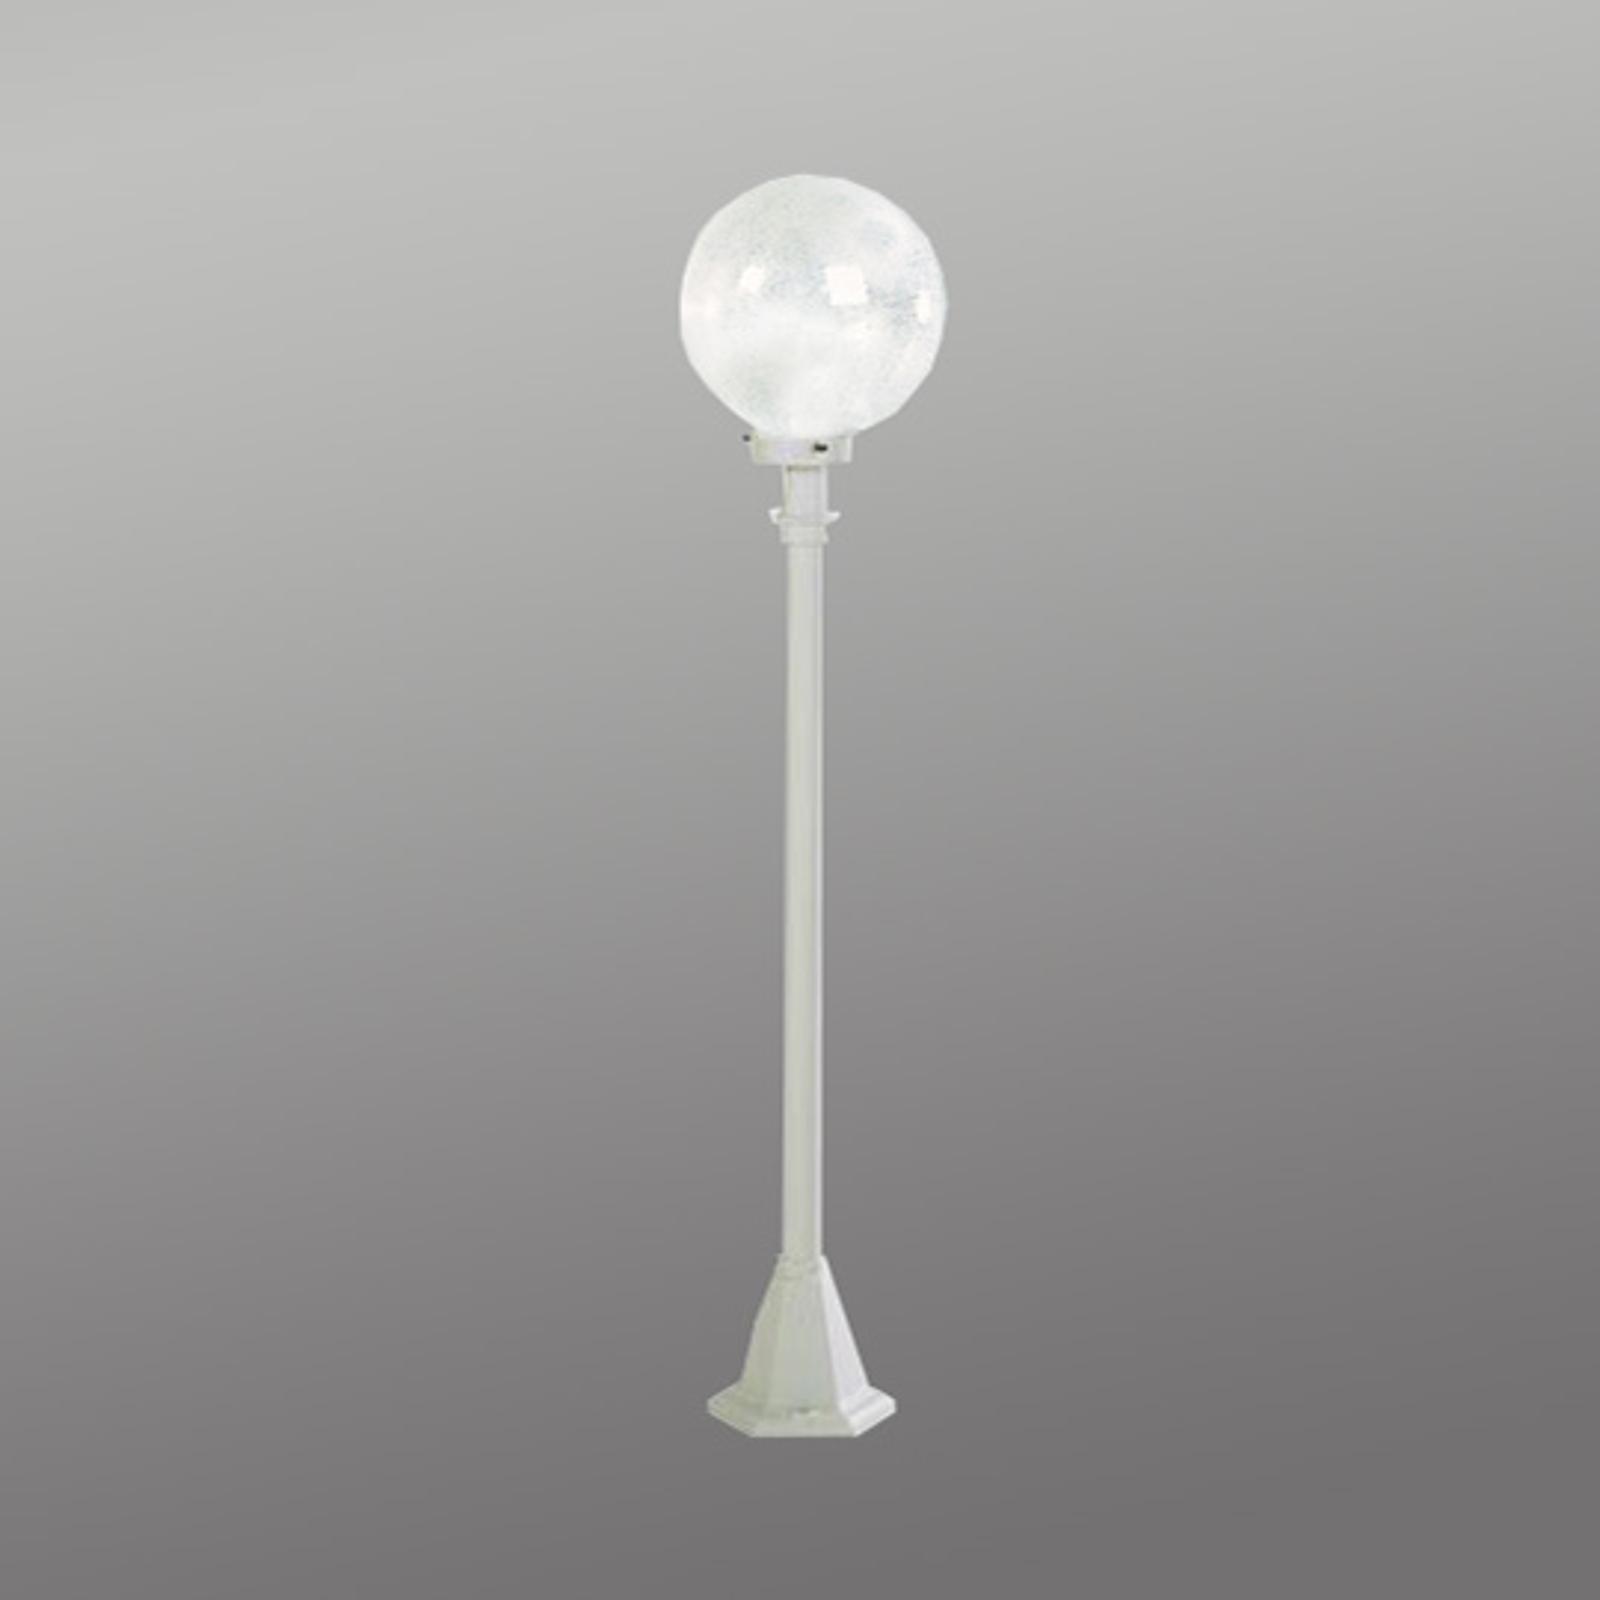 Tuinpadverlichting wit met bubbelglas